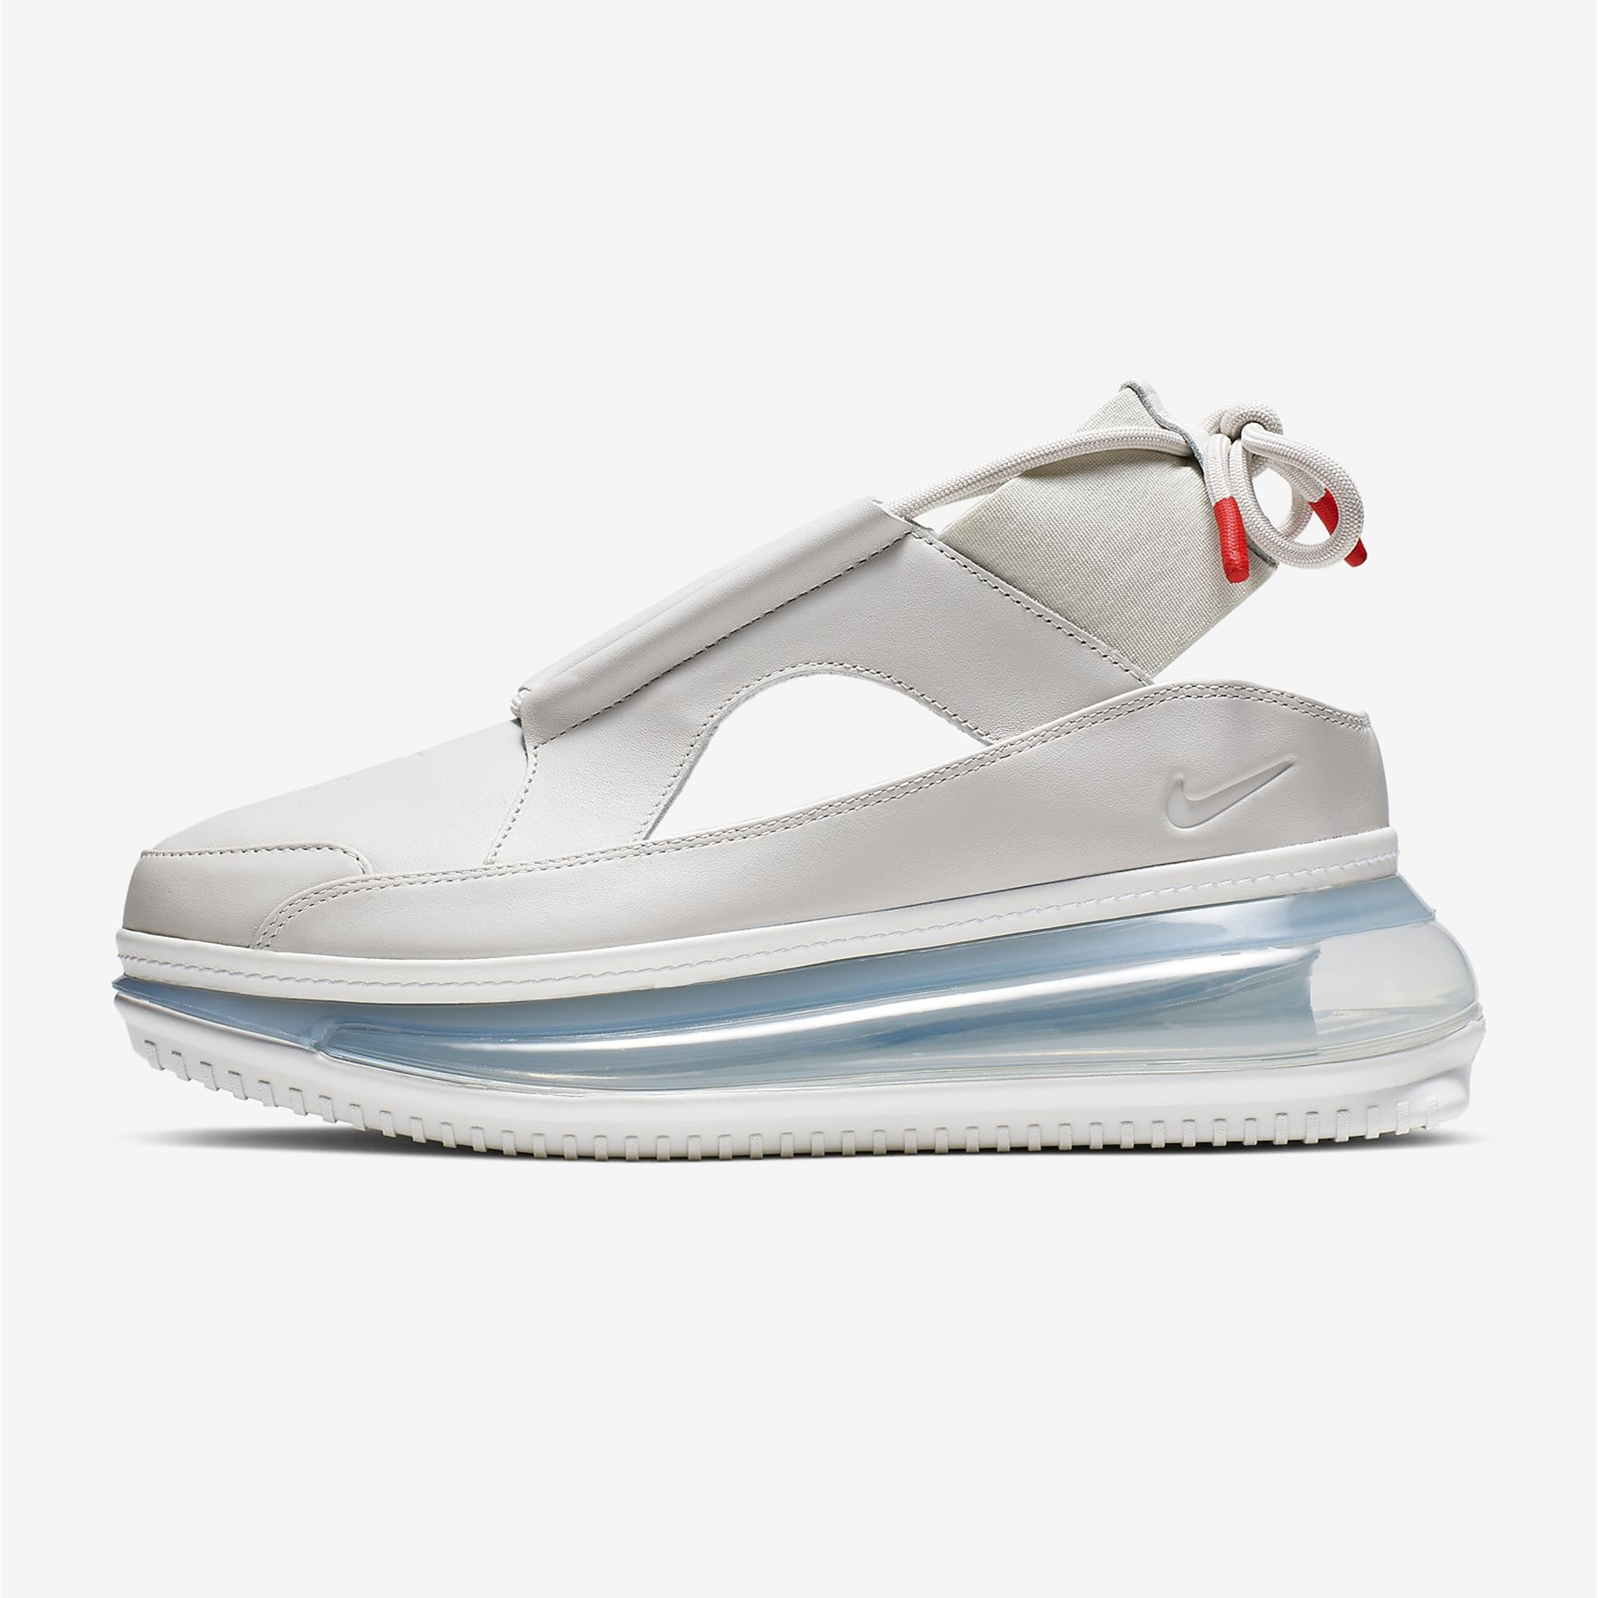 Nike 耐克 Air Max FF 720 女子运动鞋